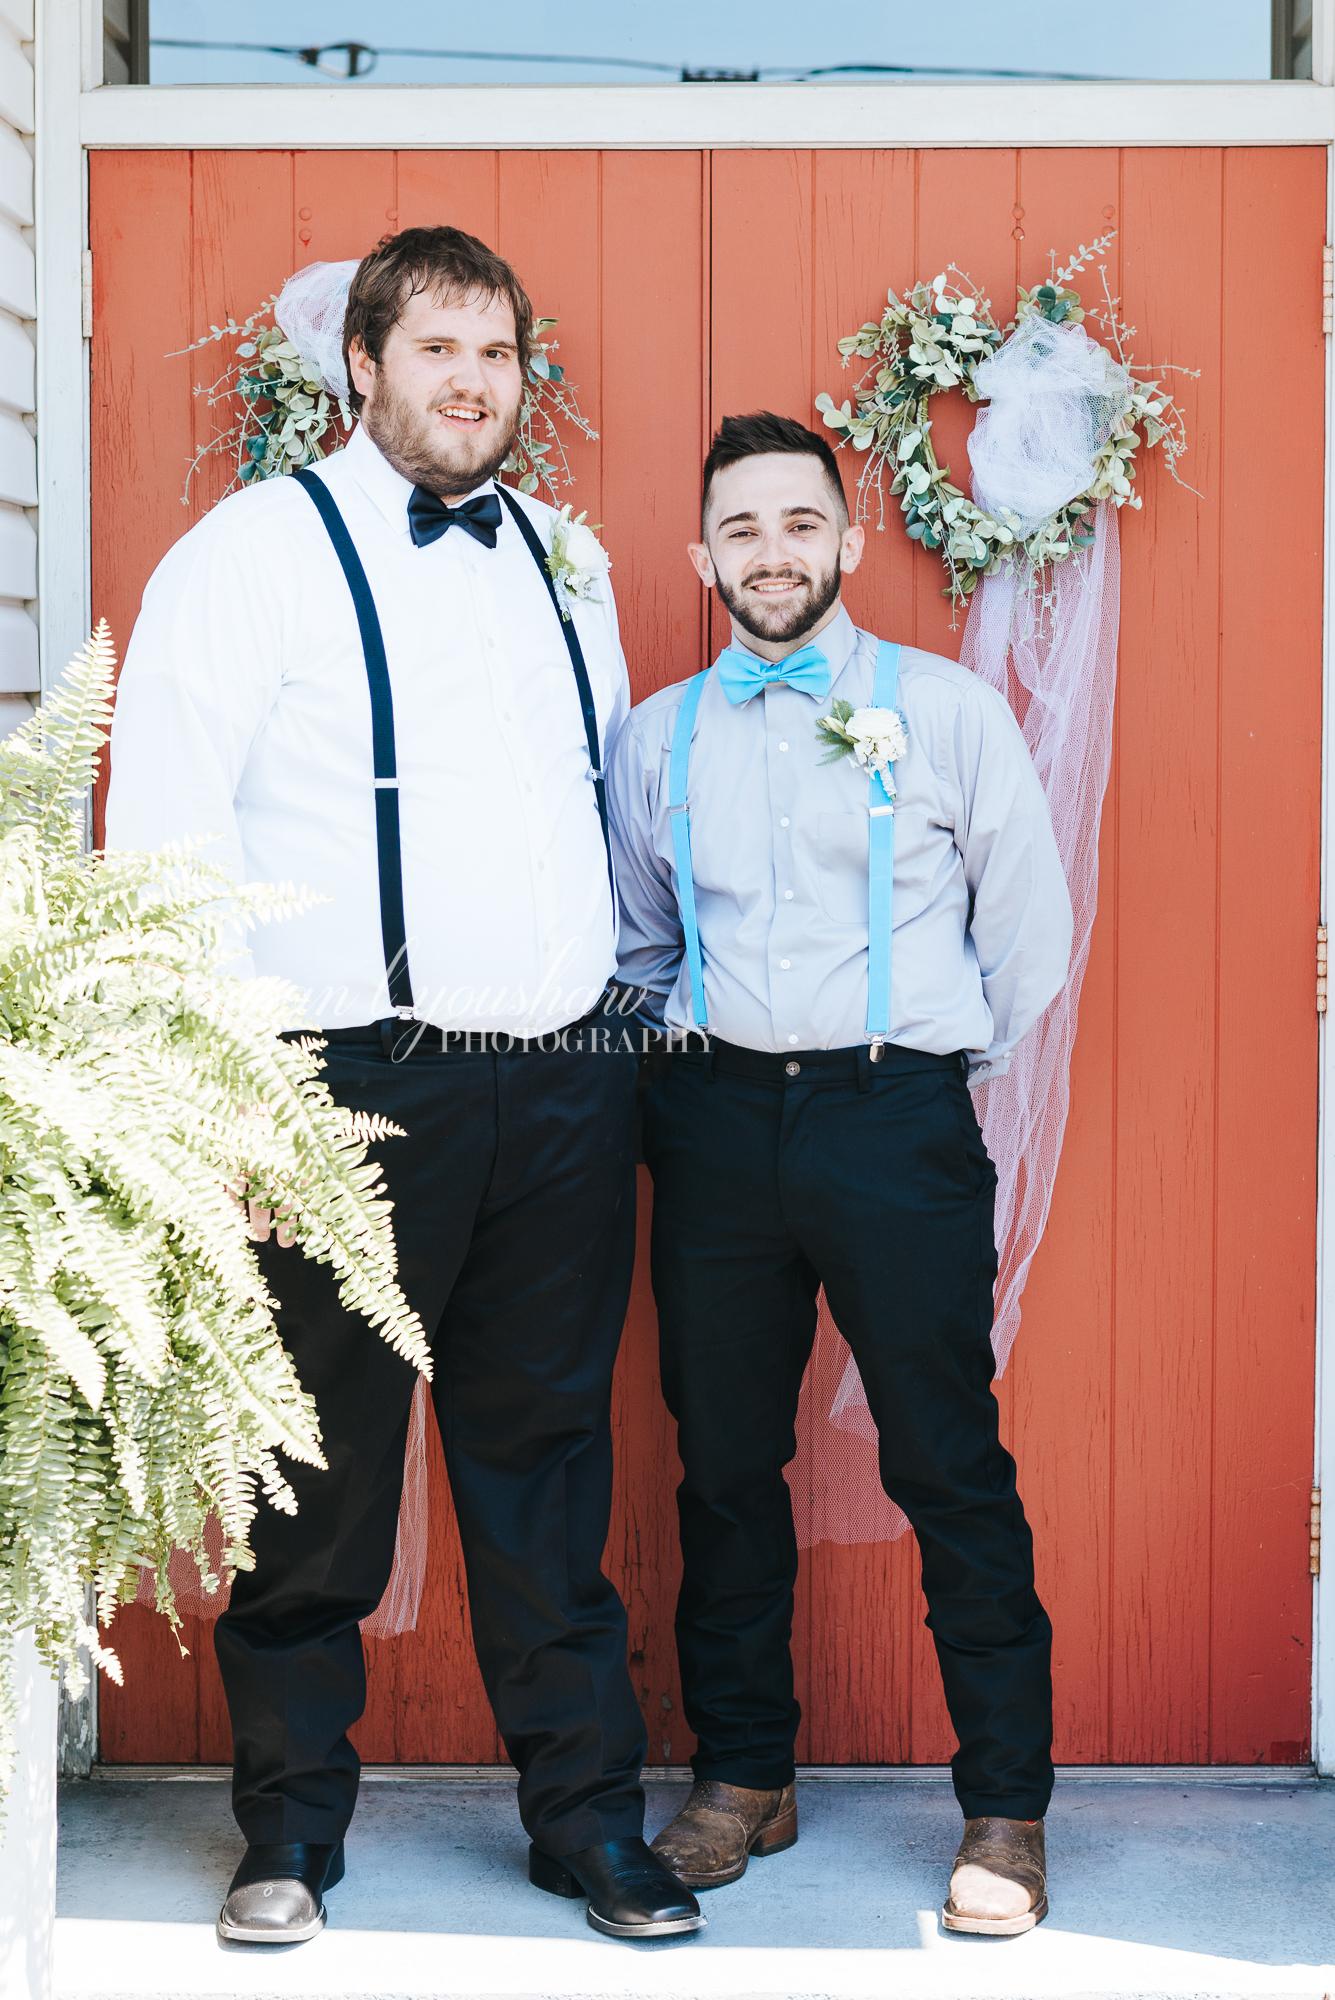 Katelyn and Wes Wedding Photos 07-13-2019 SLY Photography-20.jpg